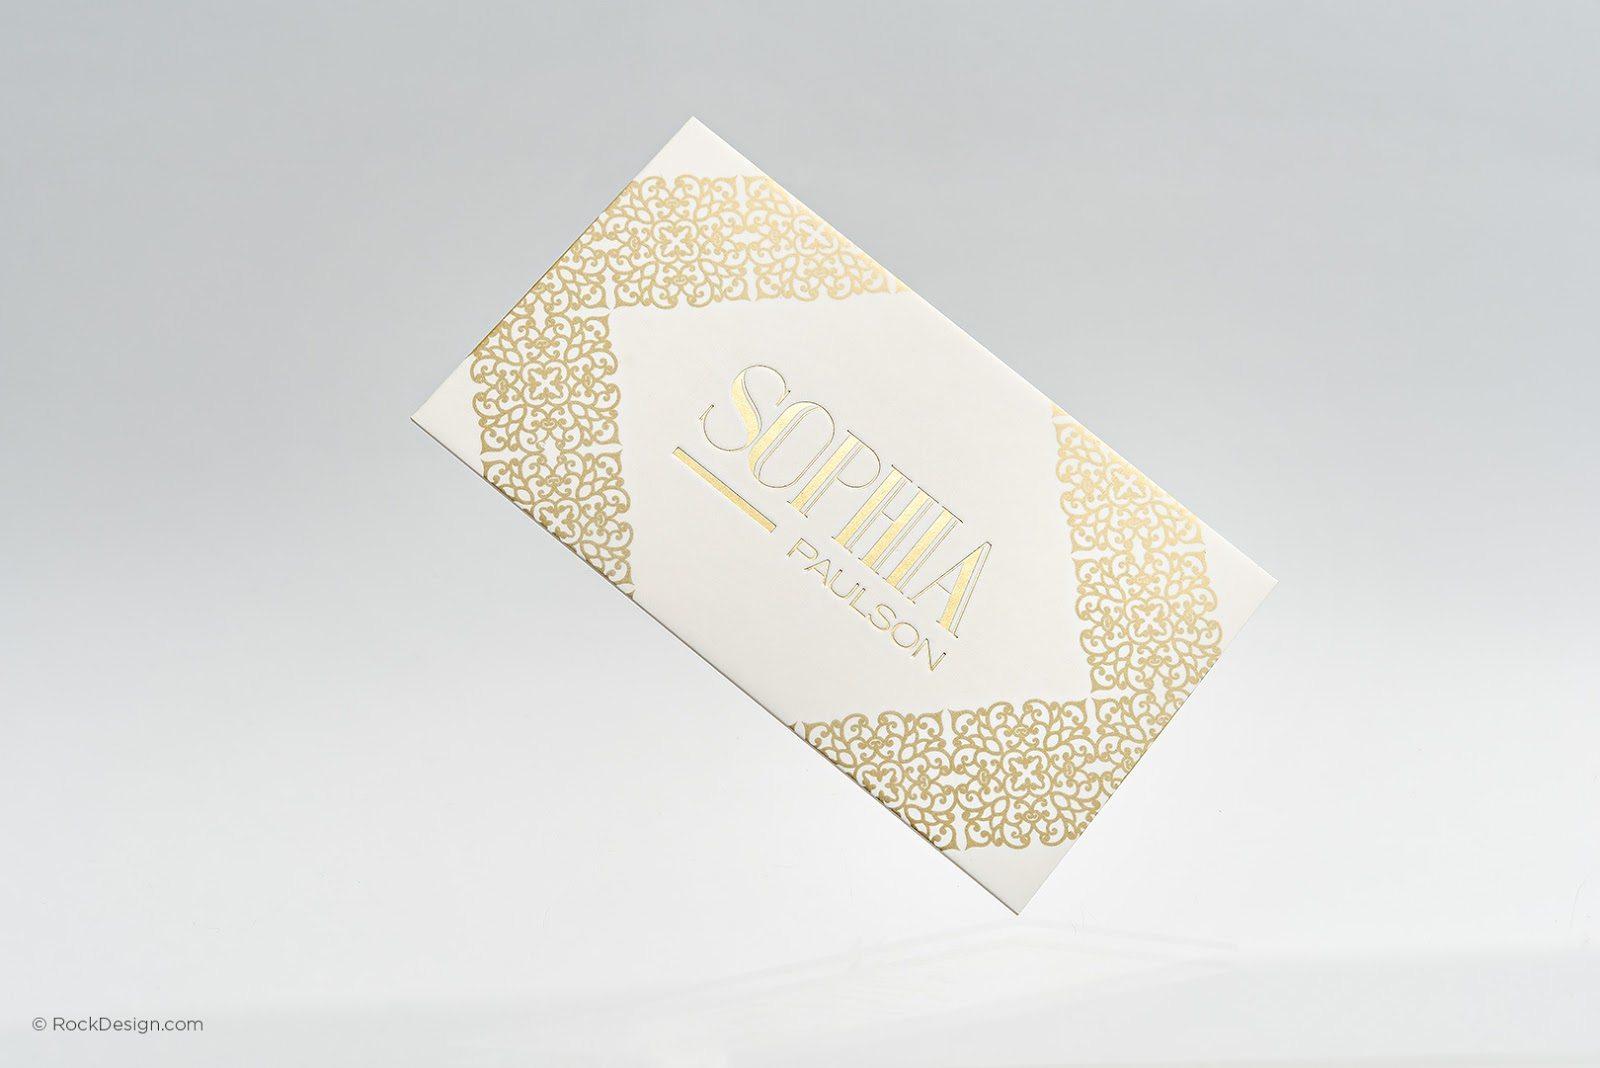 sophia-paulson-biz-card